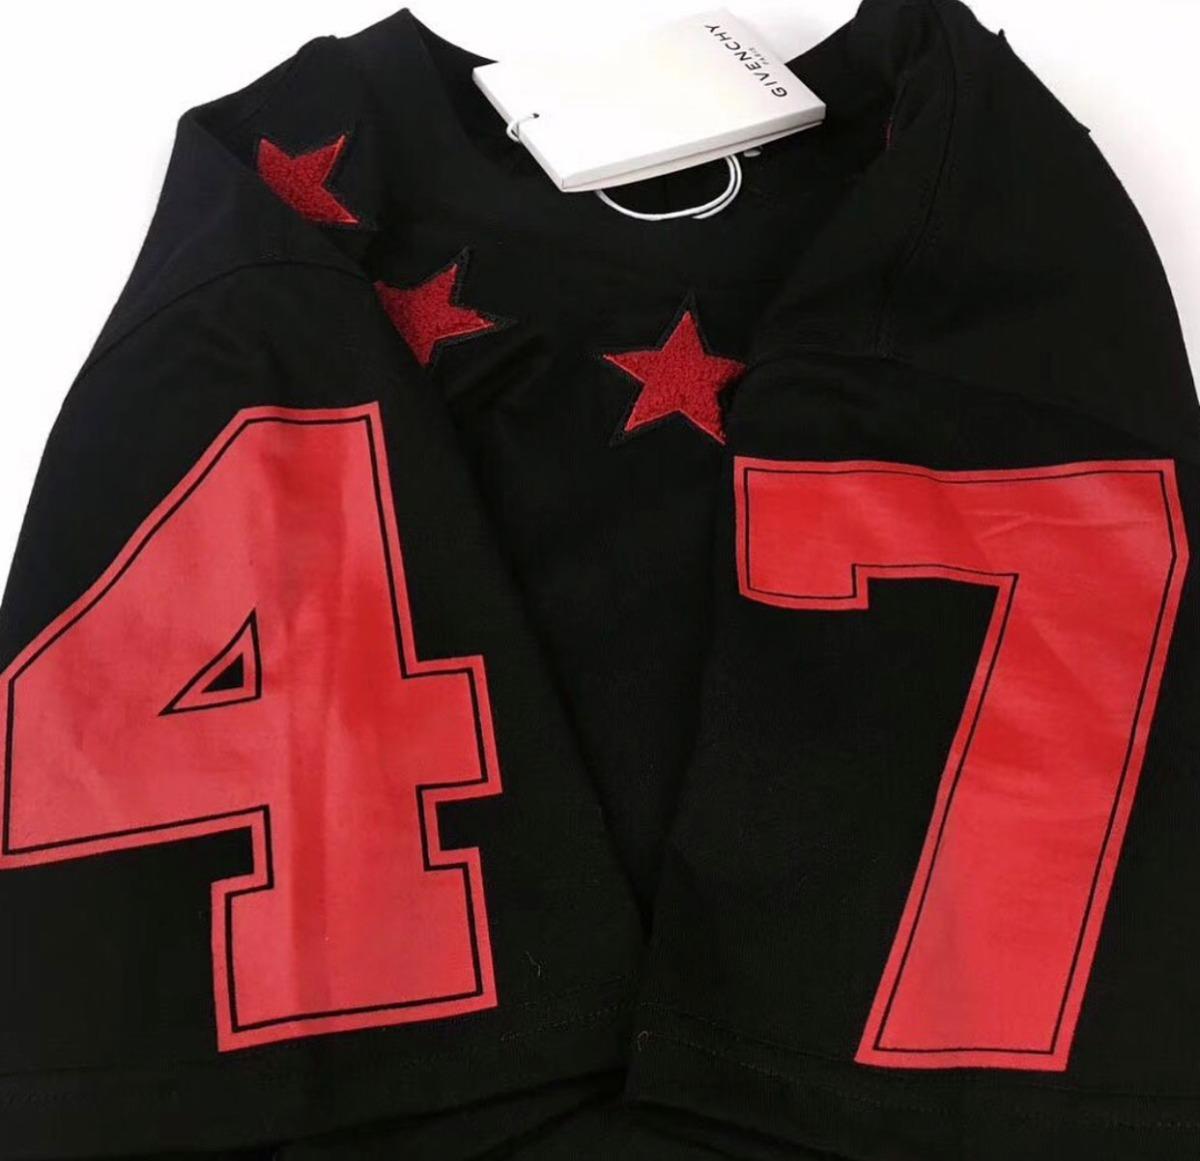 c2cc4833b camisa camiseta givenchy estrelas masculina - pronta entrega. Carregando  zoom.